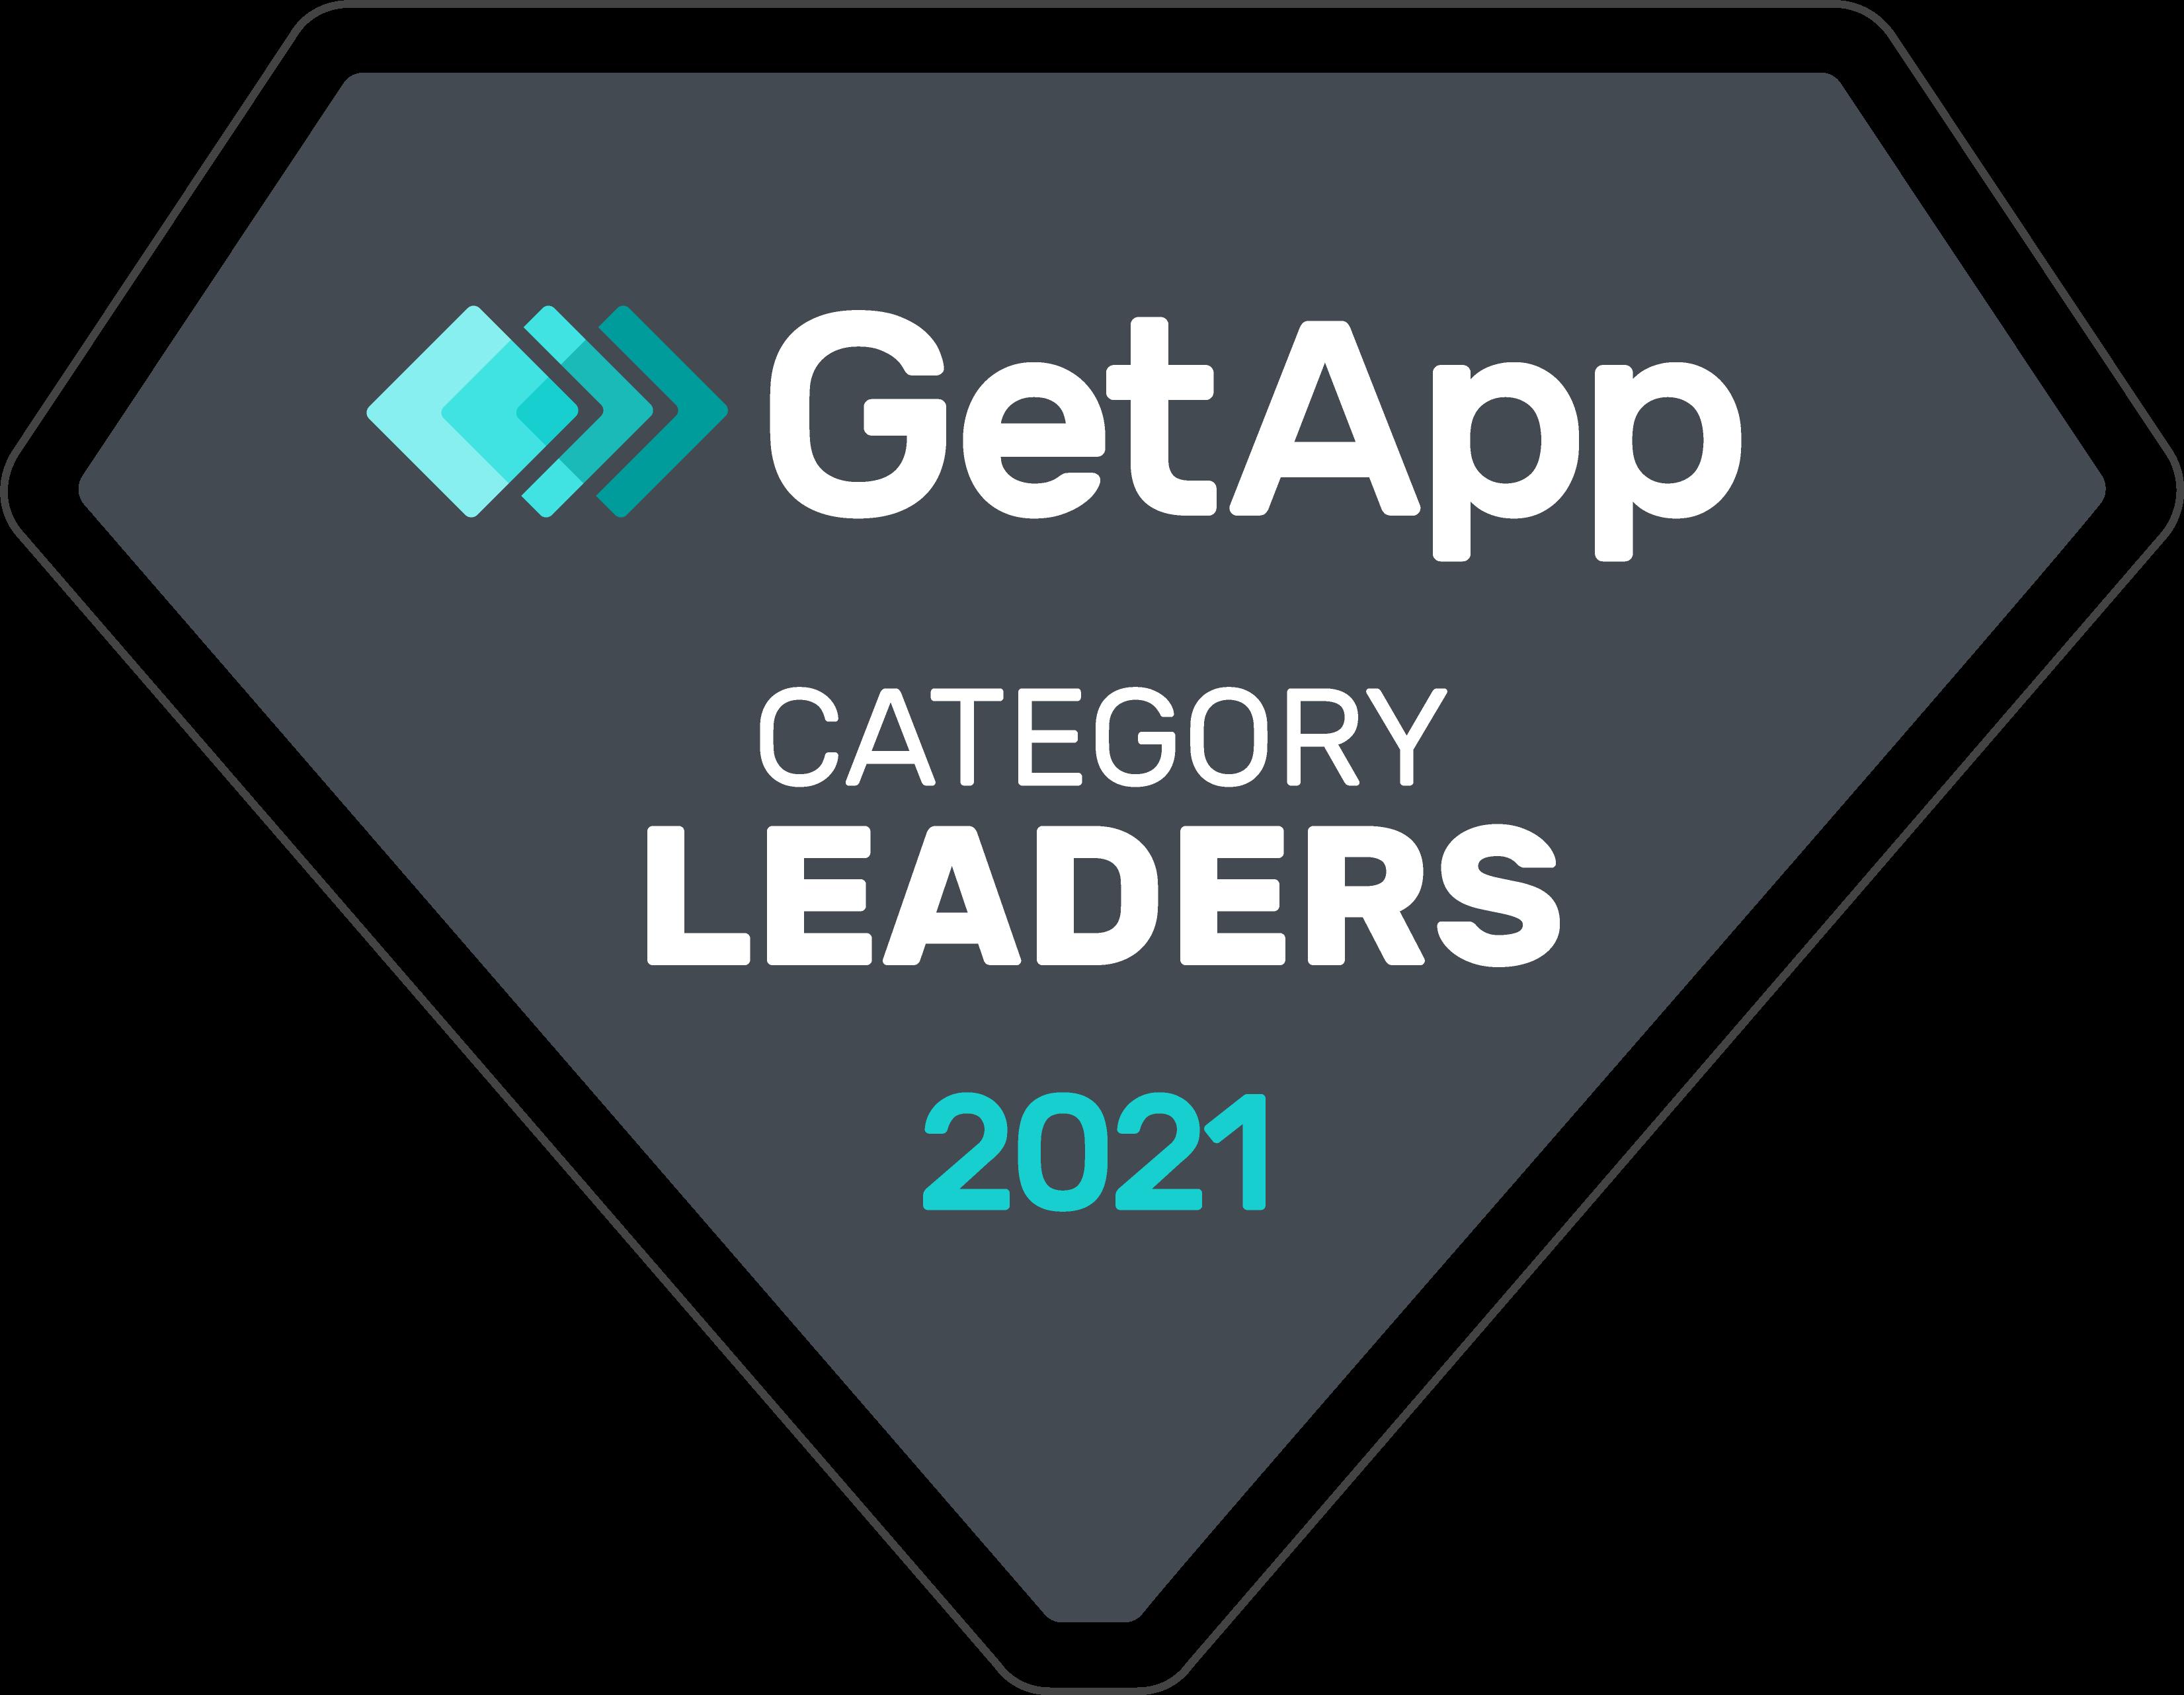 GA_Badge_Category+Leaders_2021_Full+Color